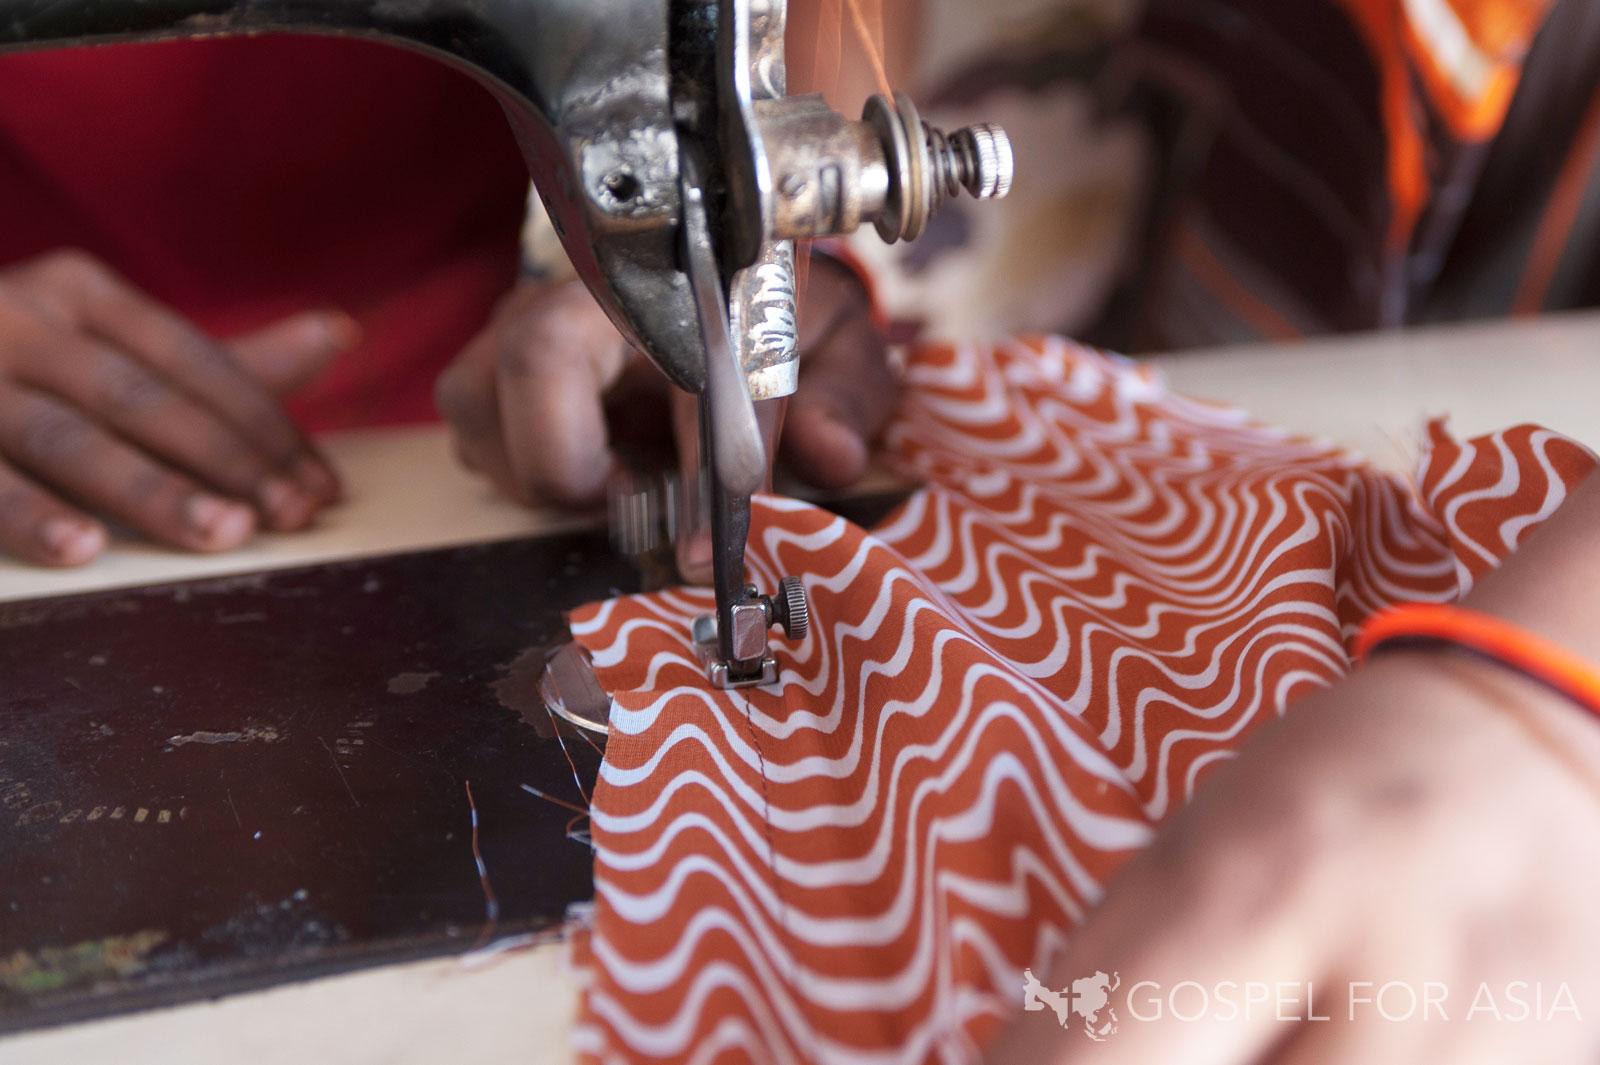 Stigma, persistence, and a sewing machine